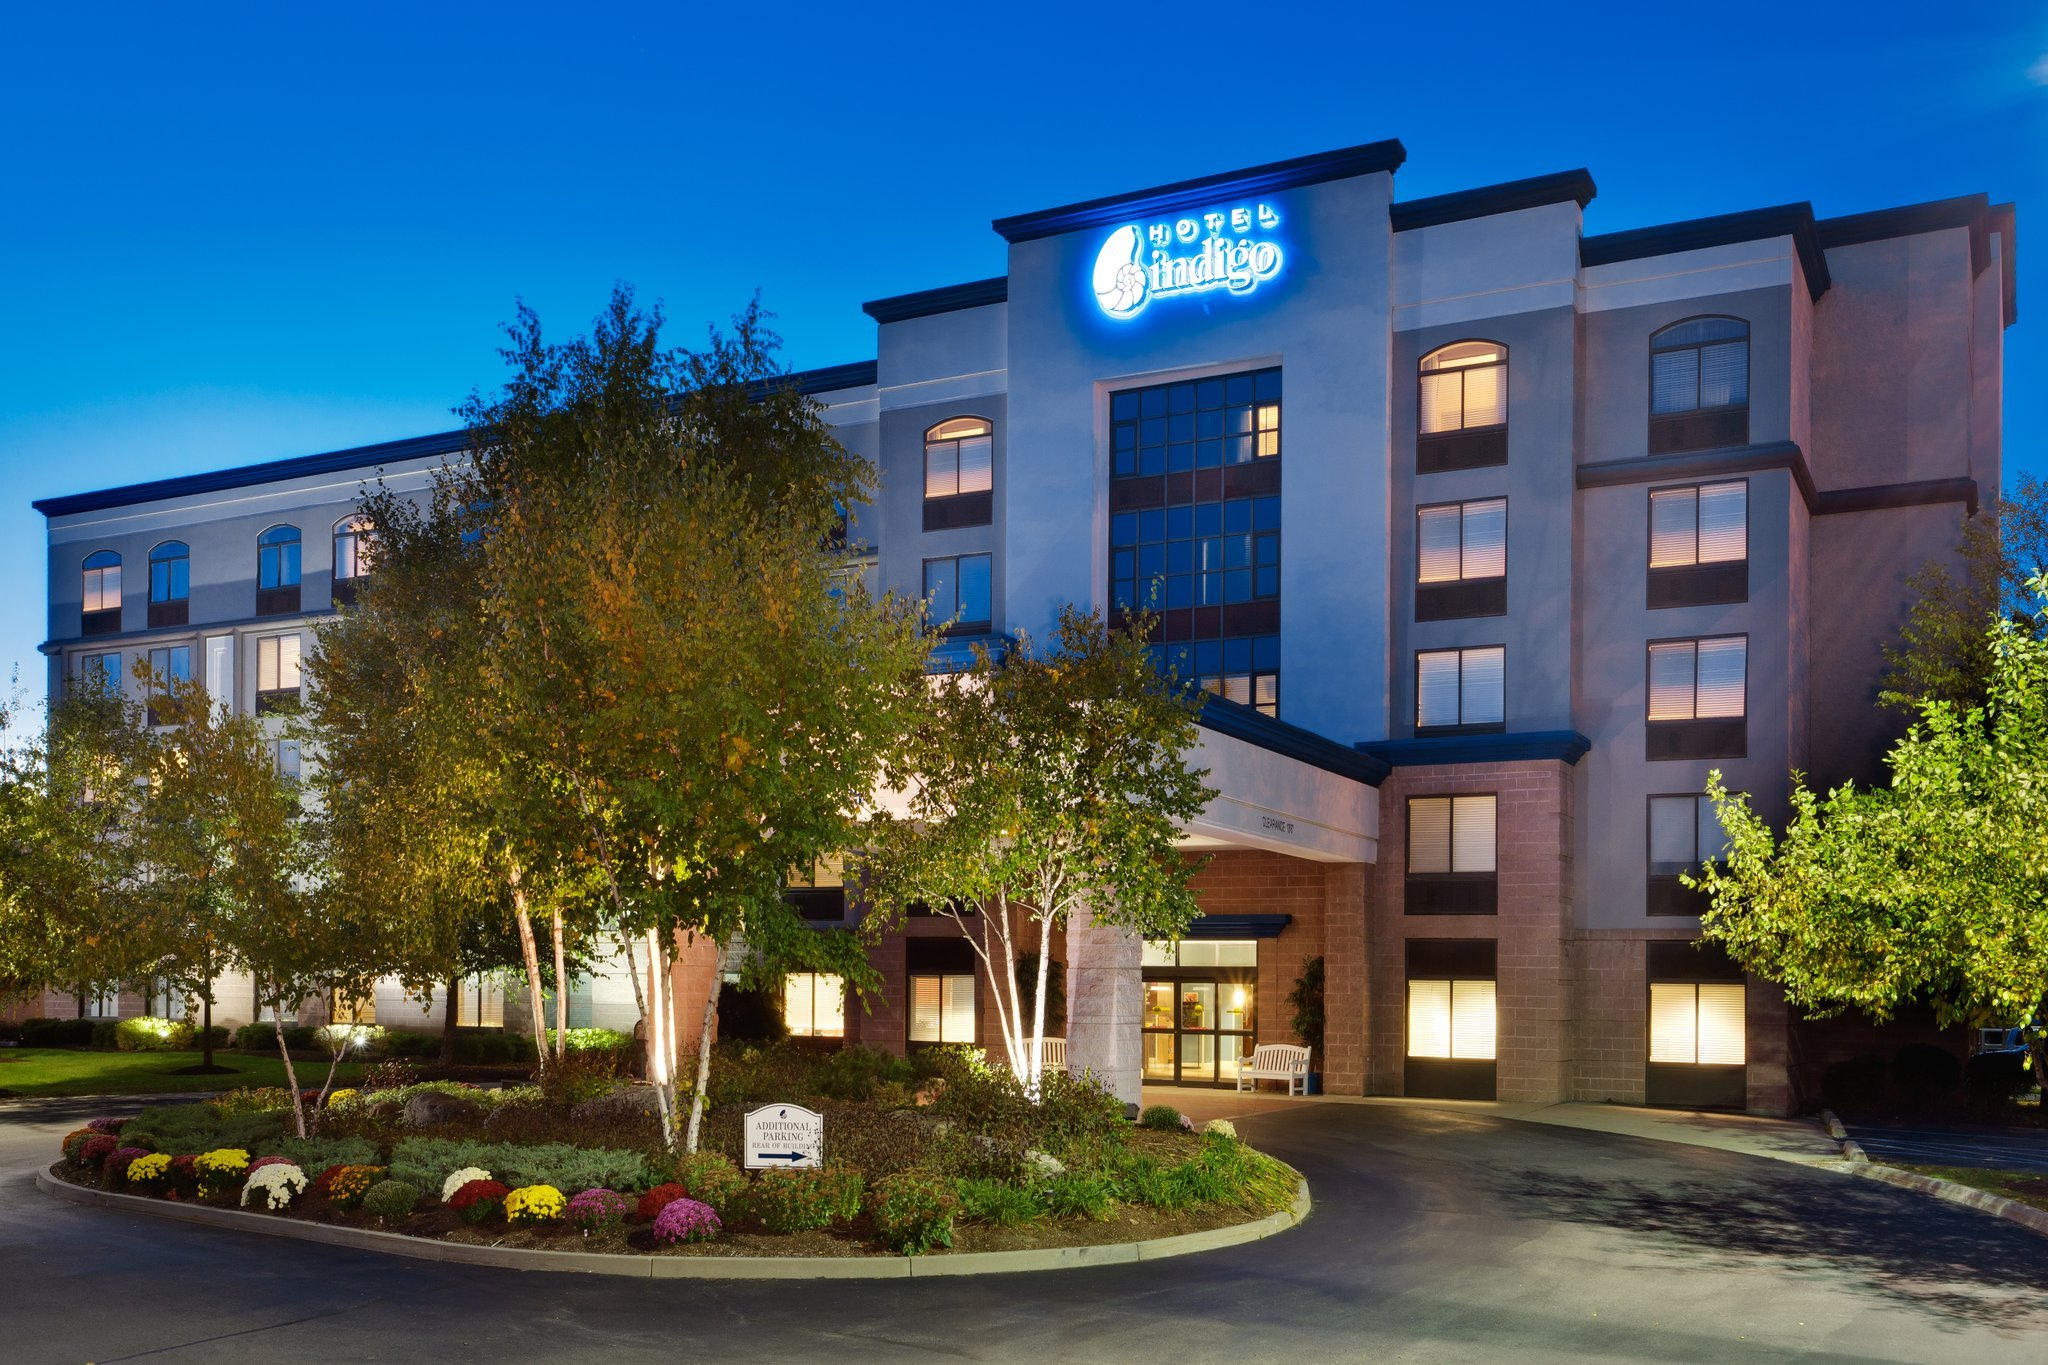 Hotel Indigo Albany-Latham